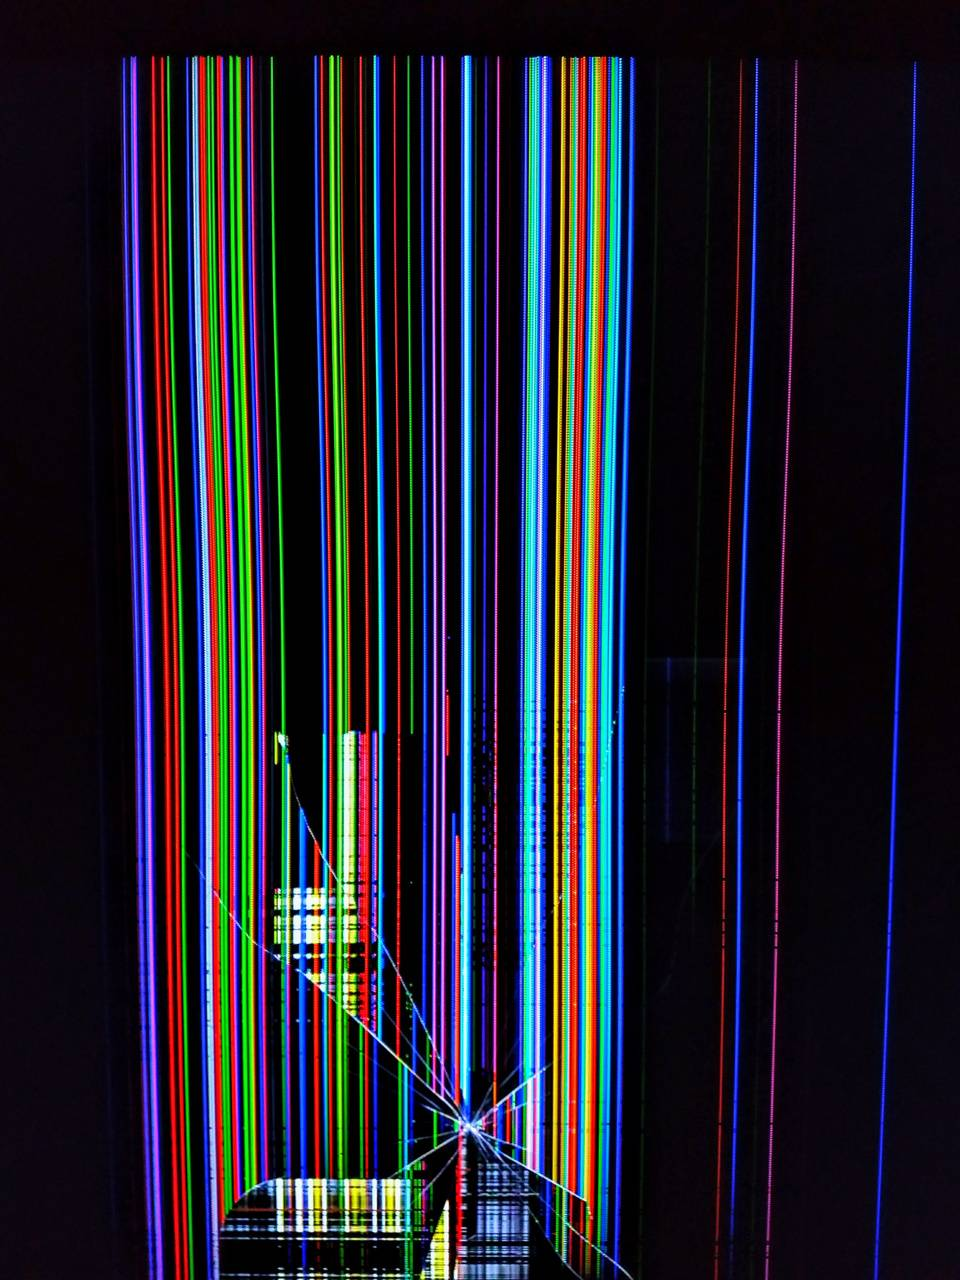 Broken screen wallpaper by 72019 - 02 - Free on ZEDGE™